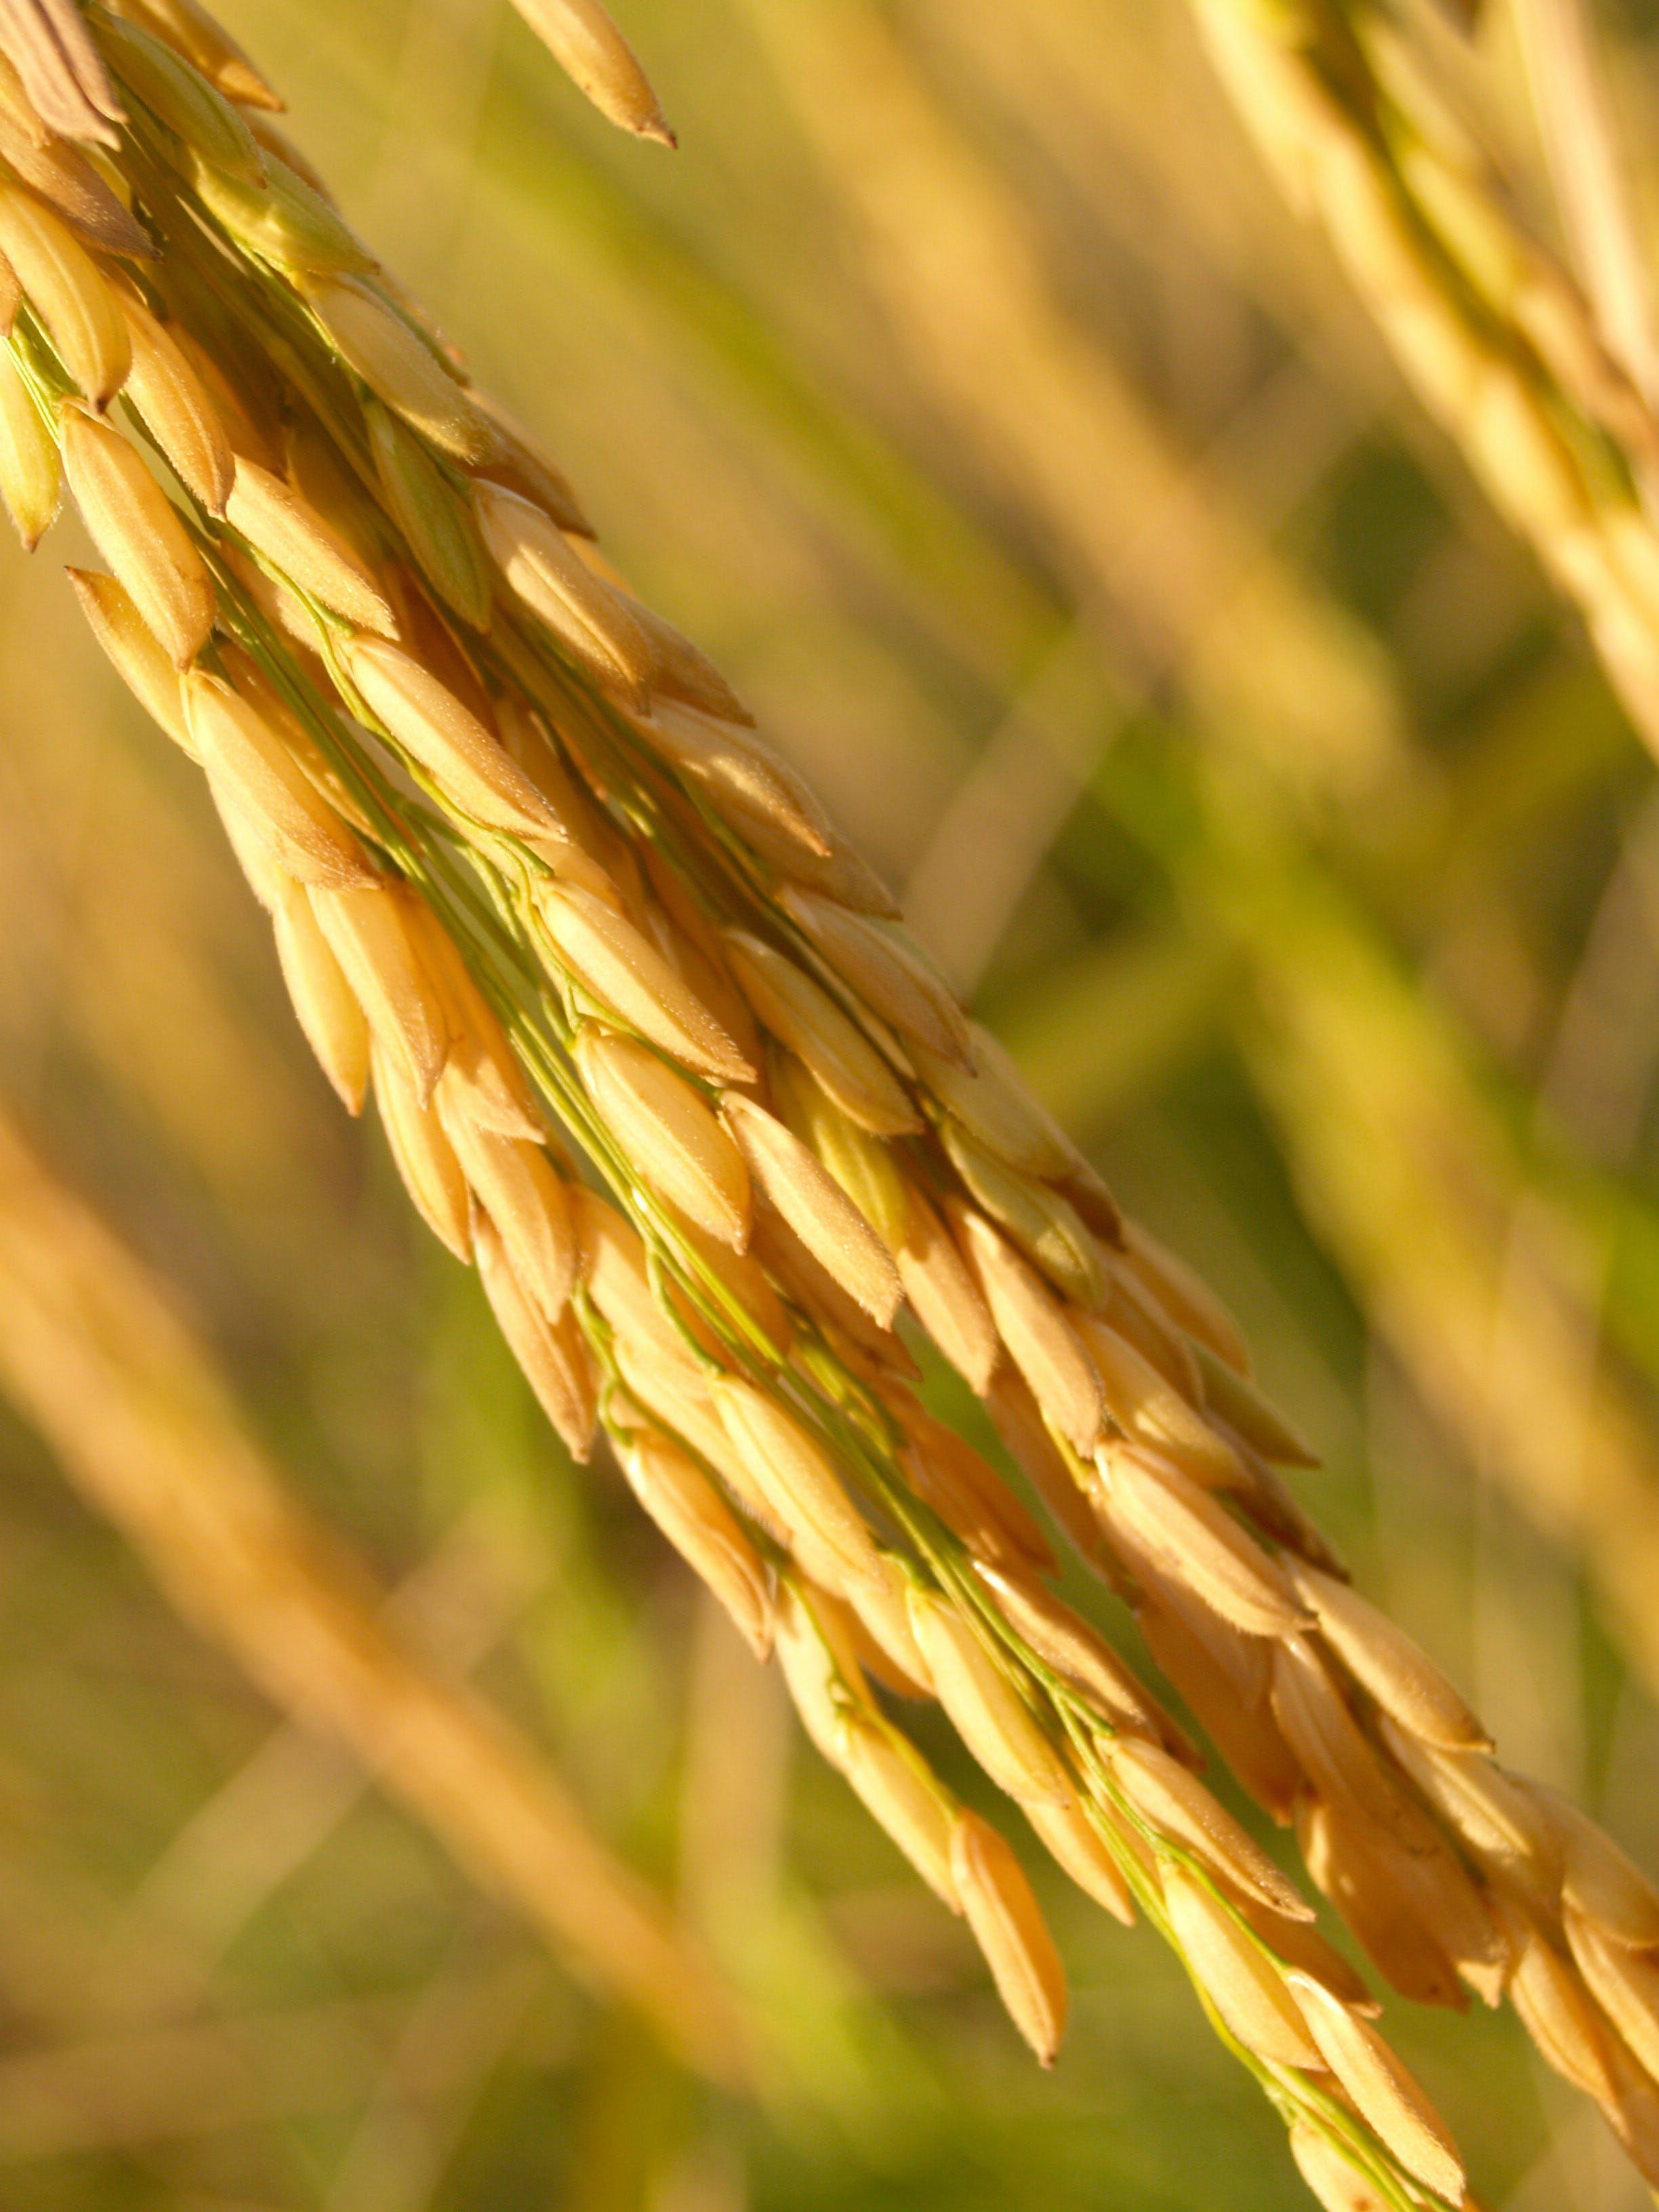 Selective Photography of Wheath